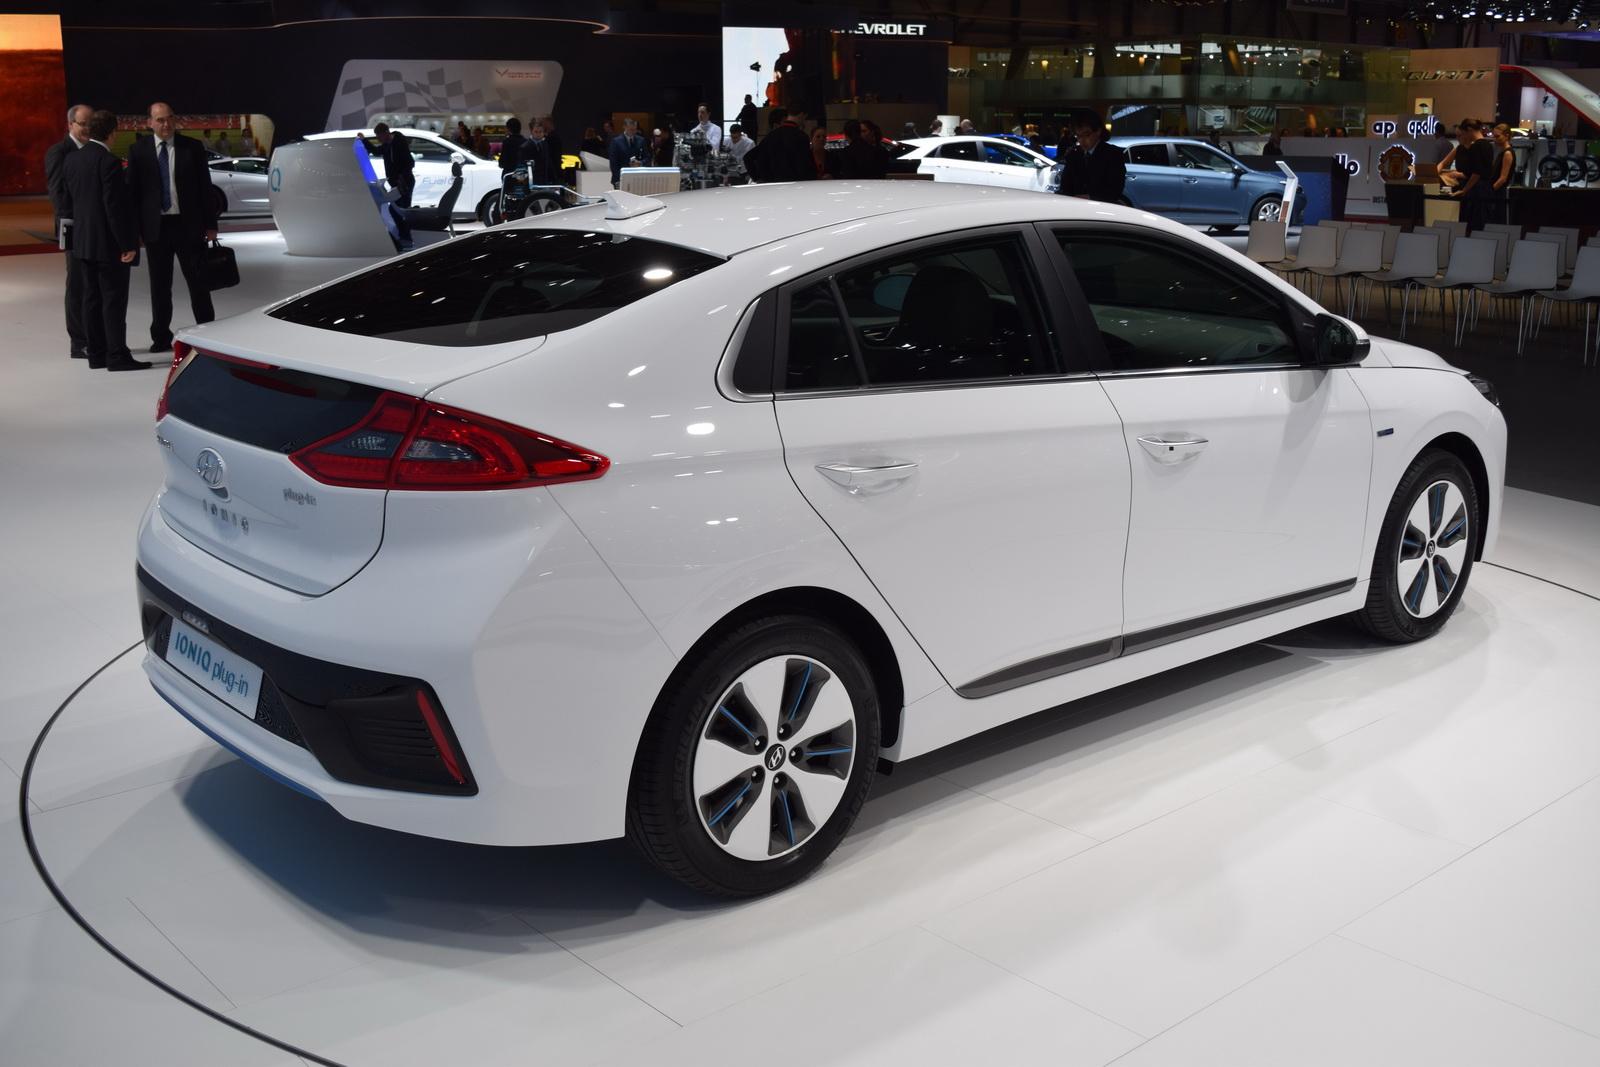 Cadillac Ats Vs The World Categories Electric Vehicles Geneva Motor Show Hybrids Hyundai Hyundai ...